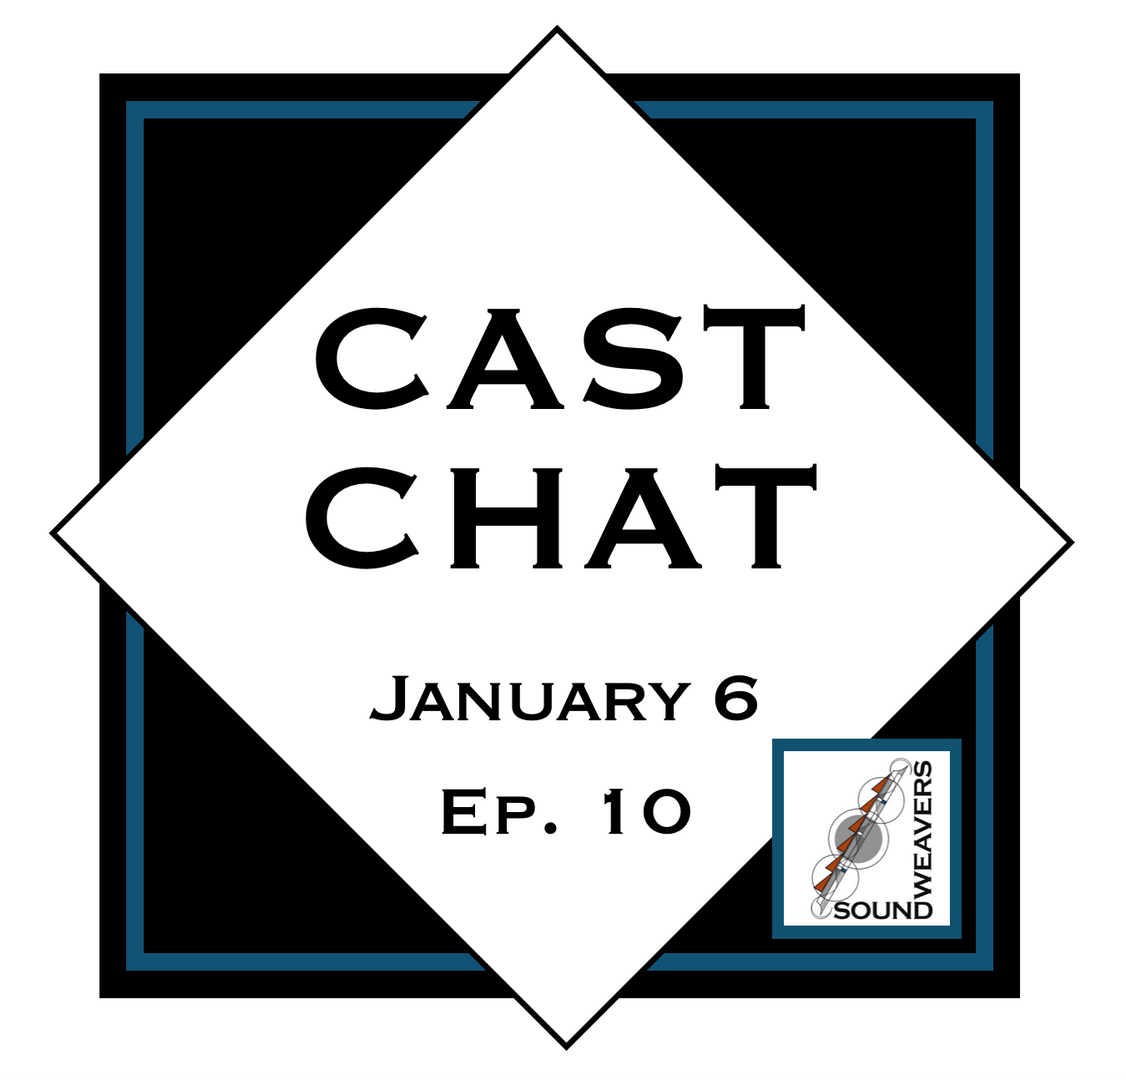 Cast Chat Ep. 10